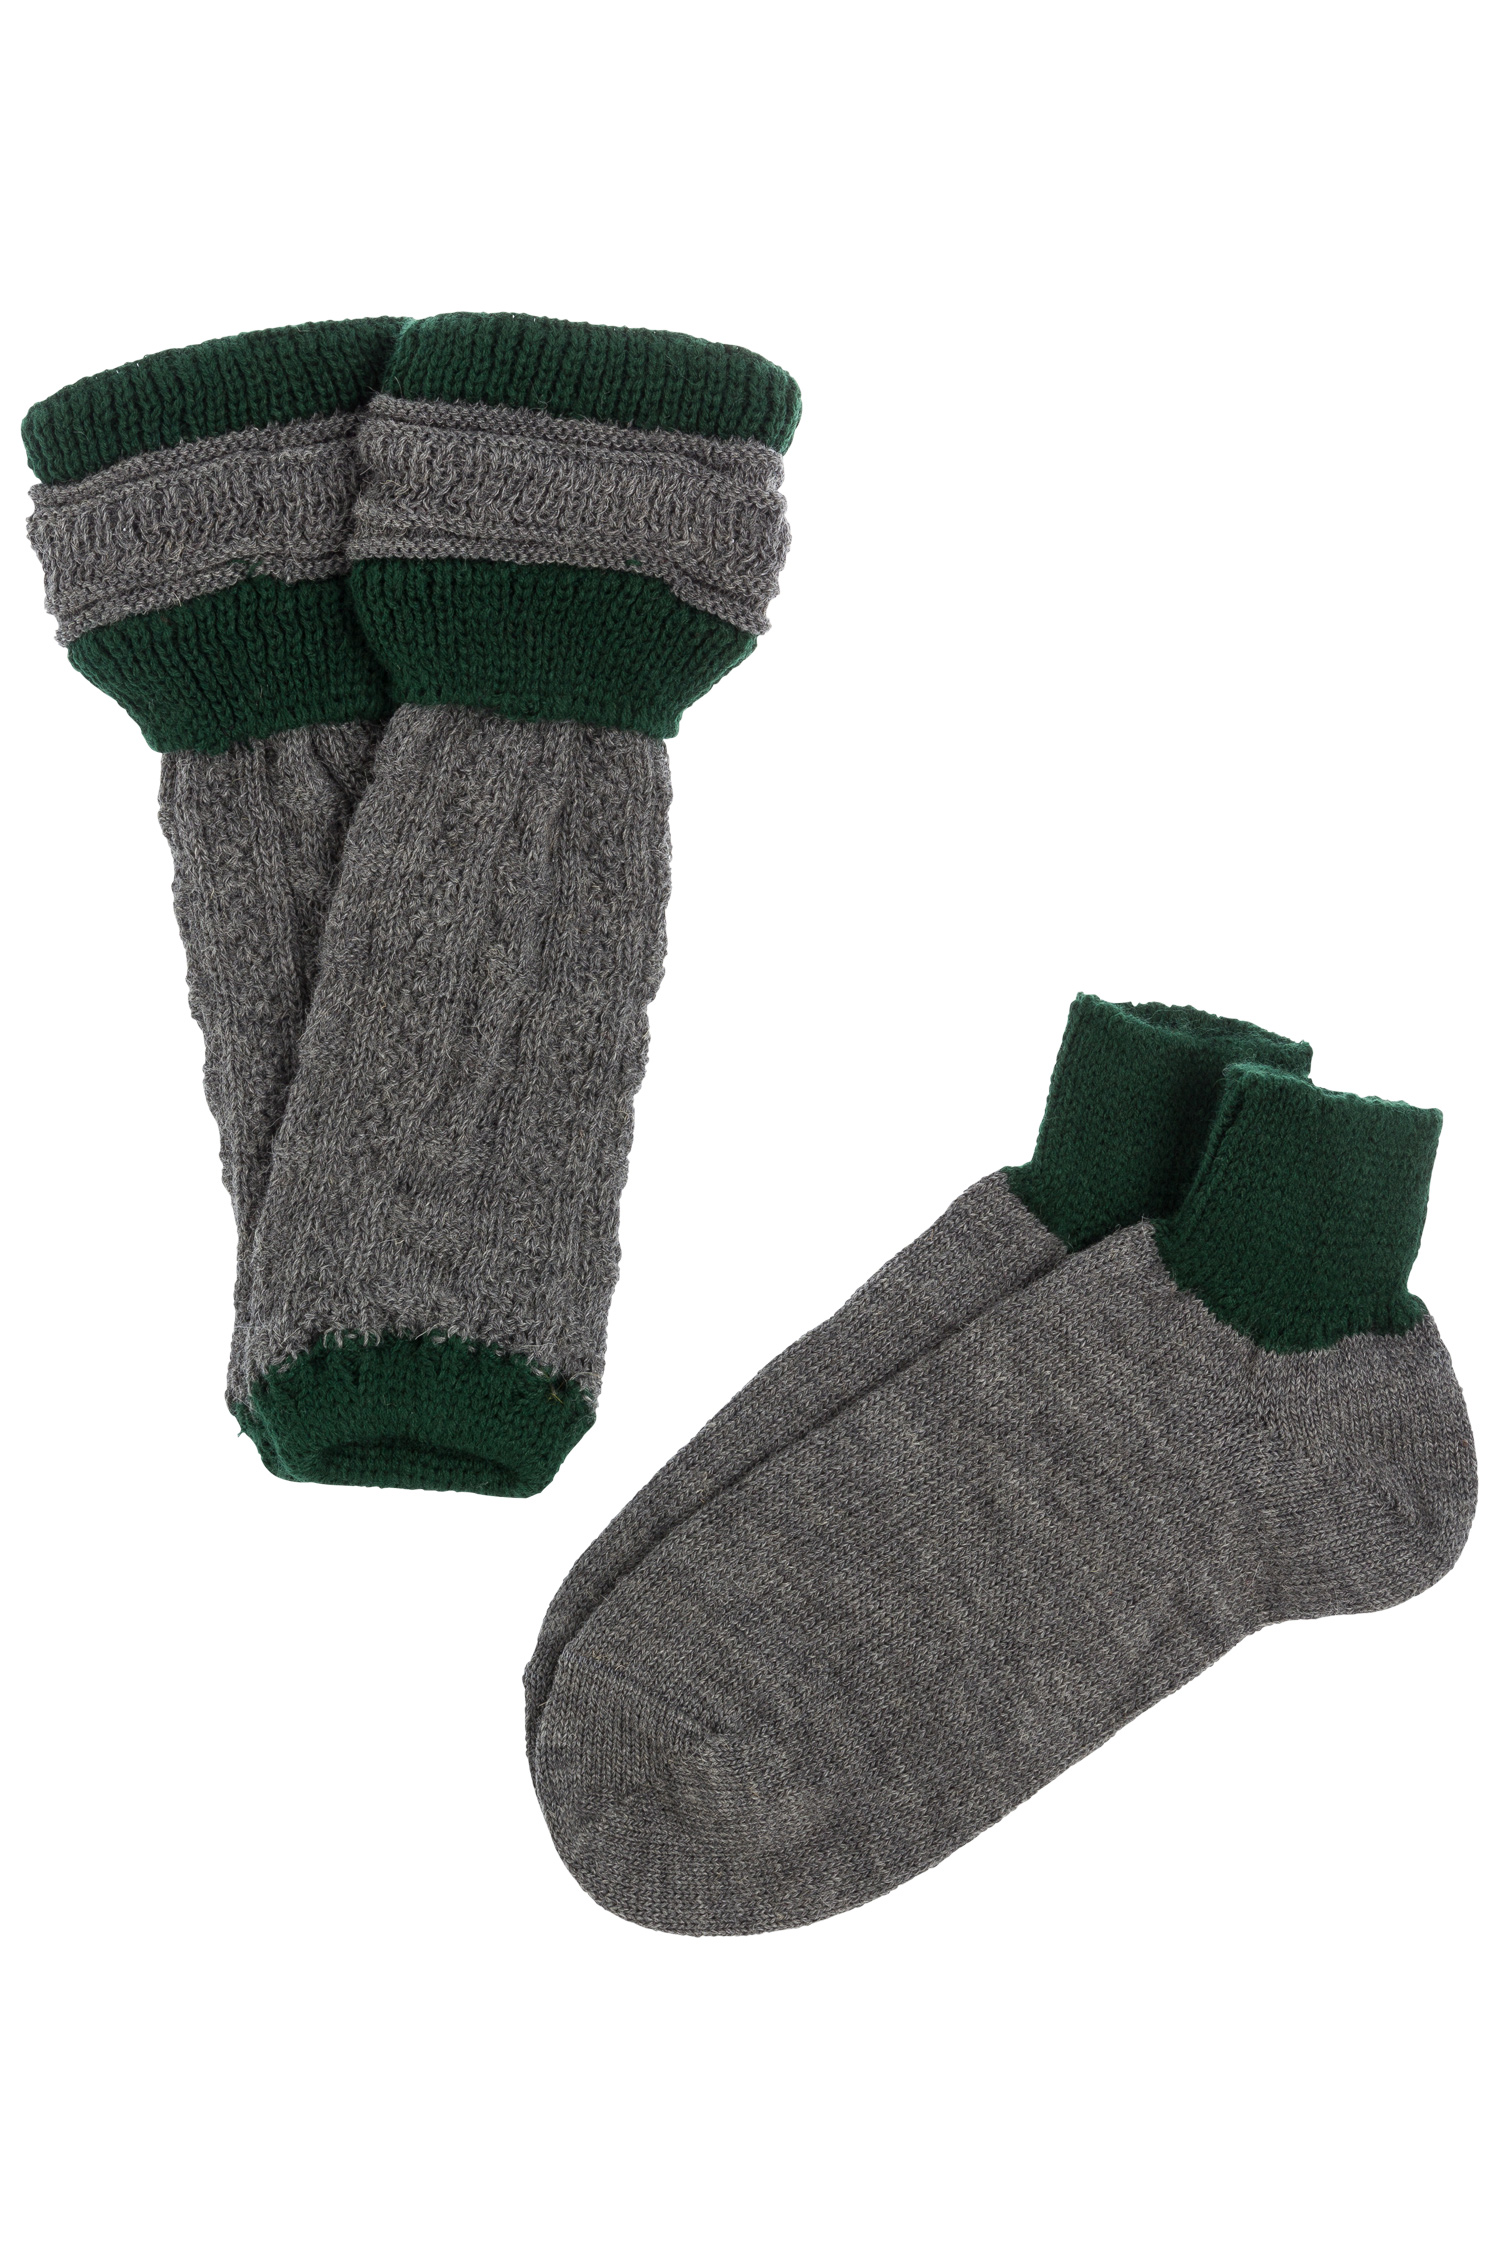 Loferl I | grau-grün